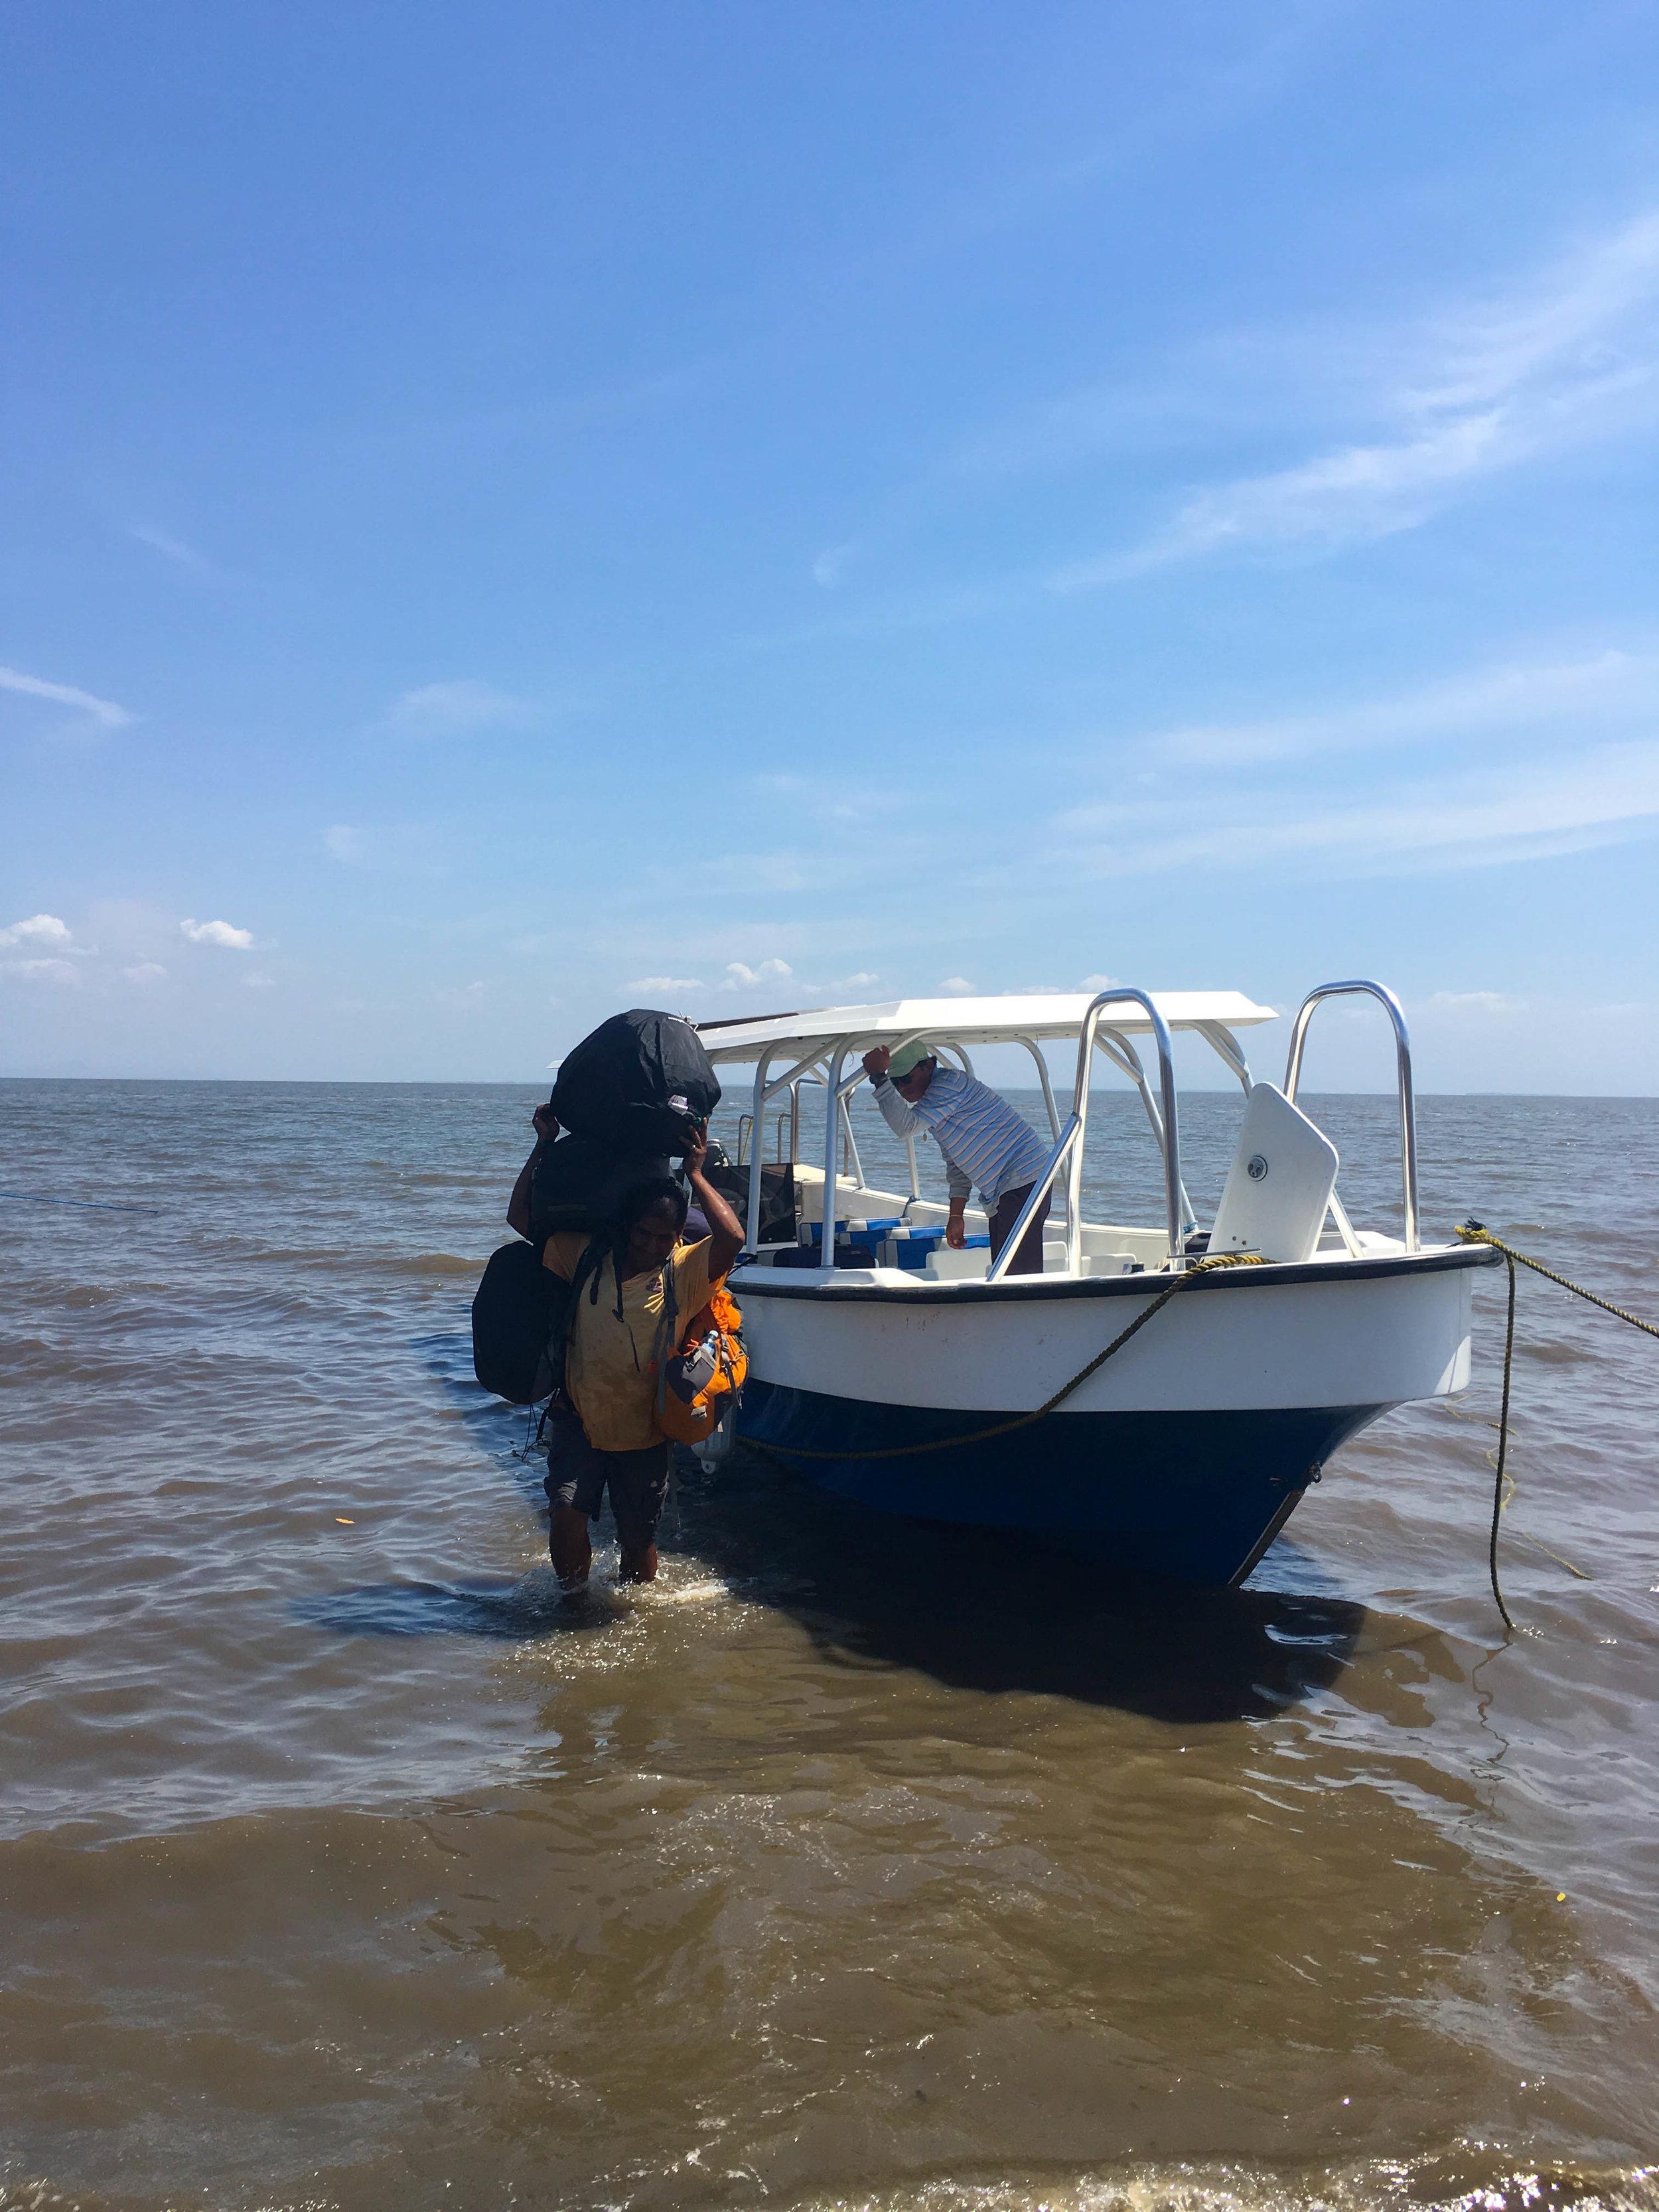 boarder nicaragua boat and lugage.jpg